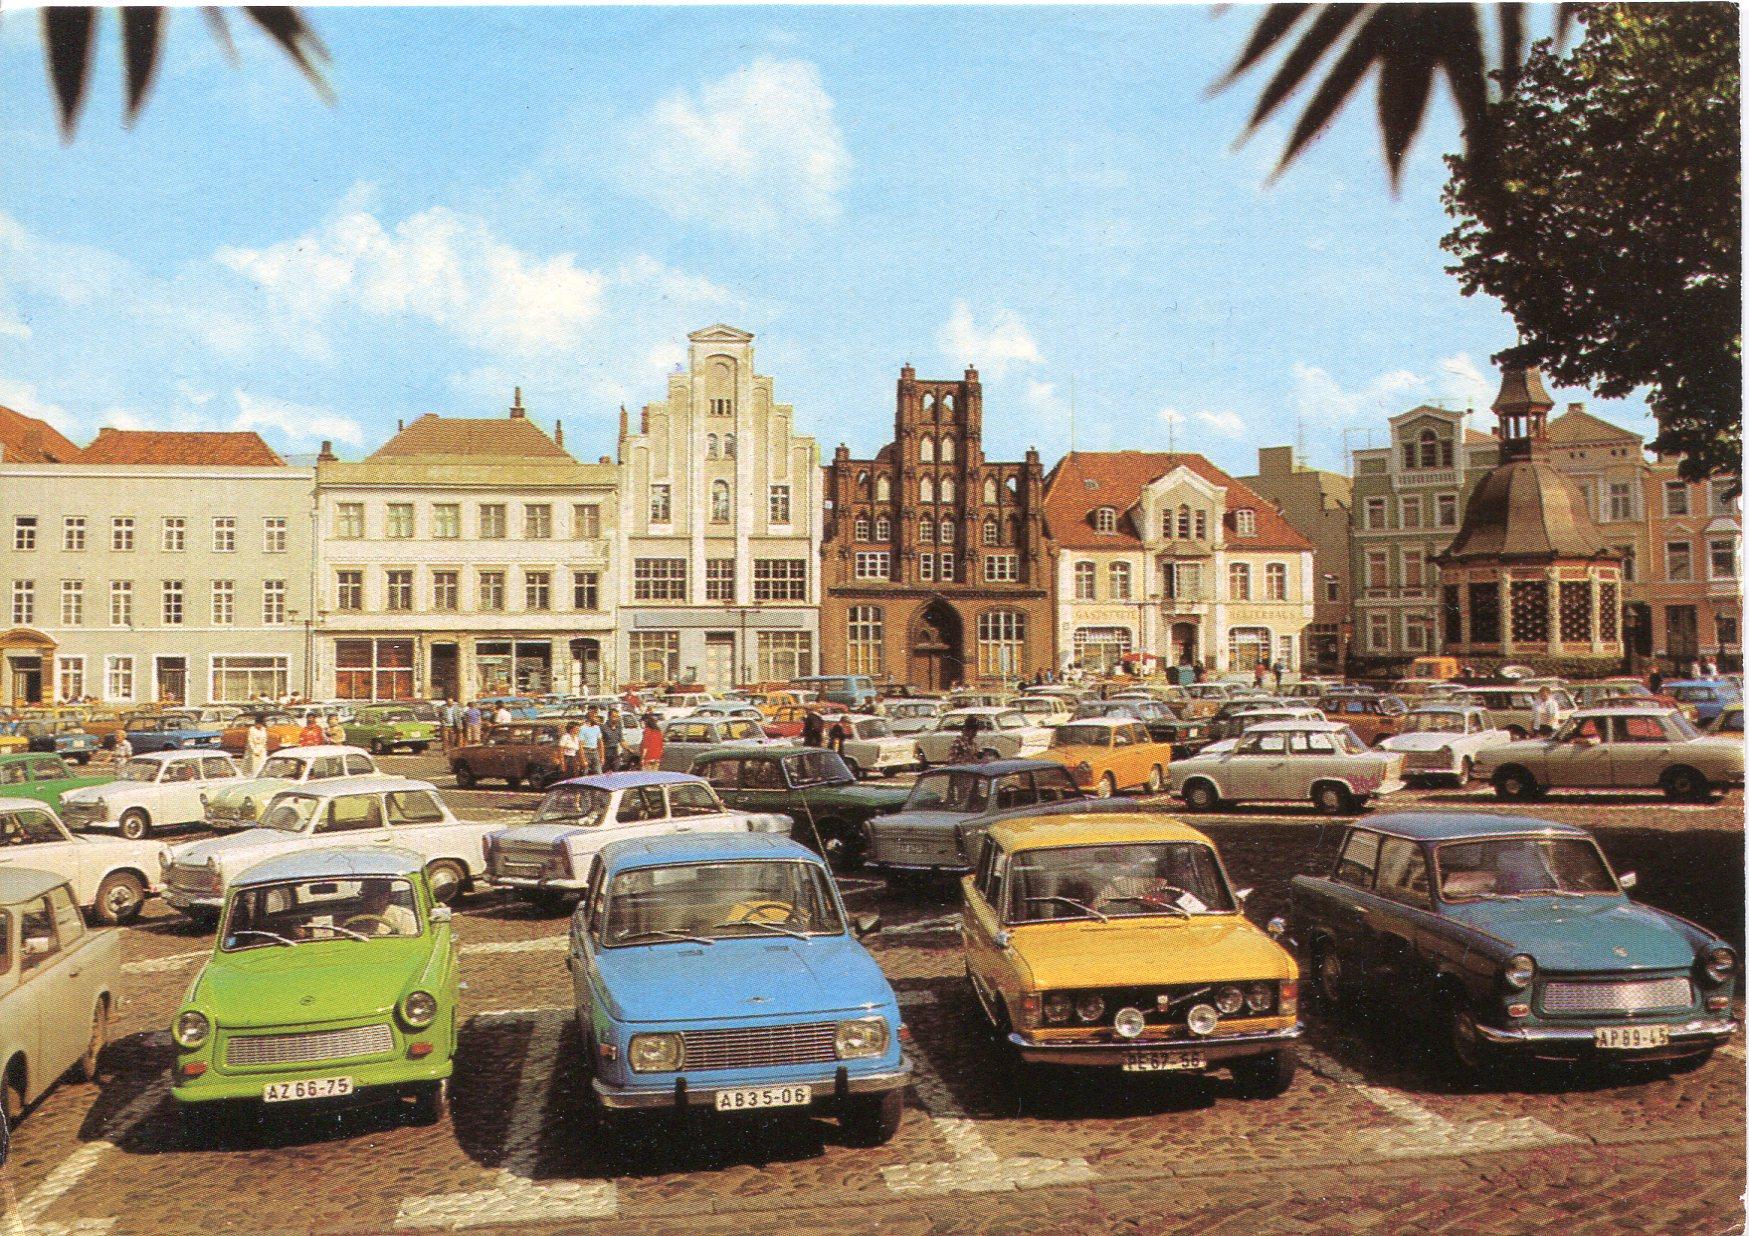 Wismar Germany  City pictures : Wismar, Germany